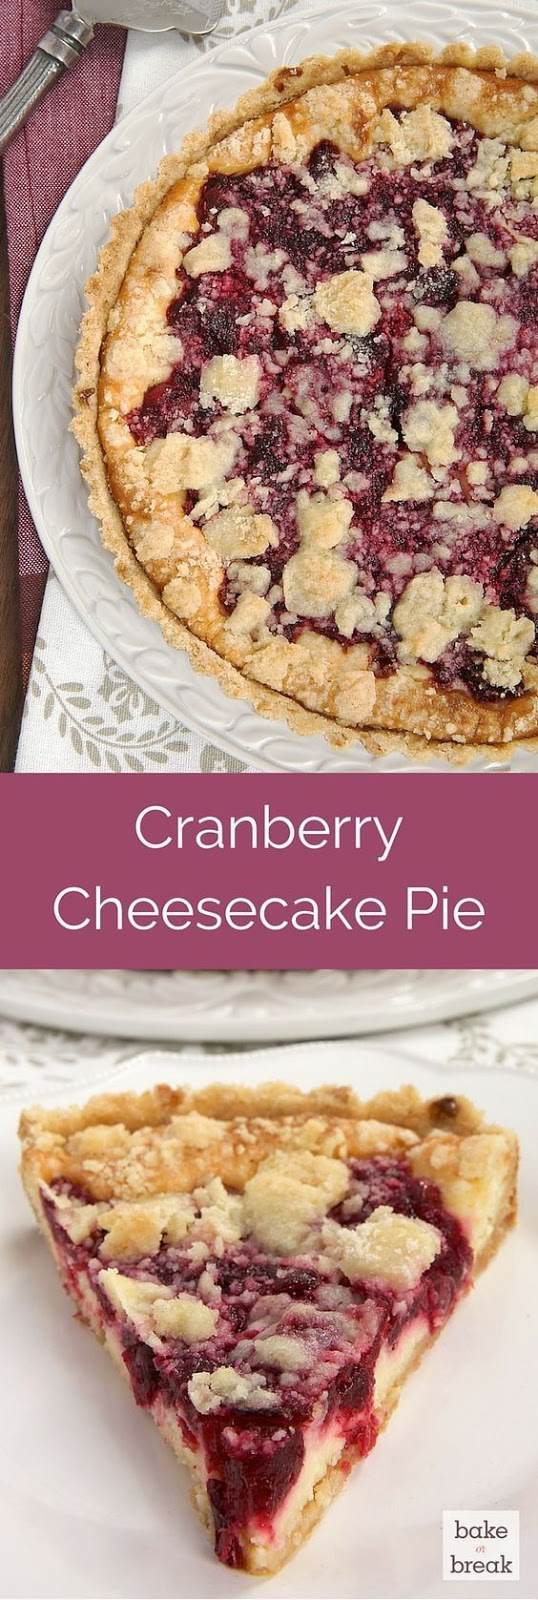 CRANBERRY CHEESECAKE PIE RECIPE